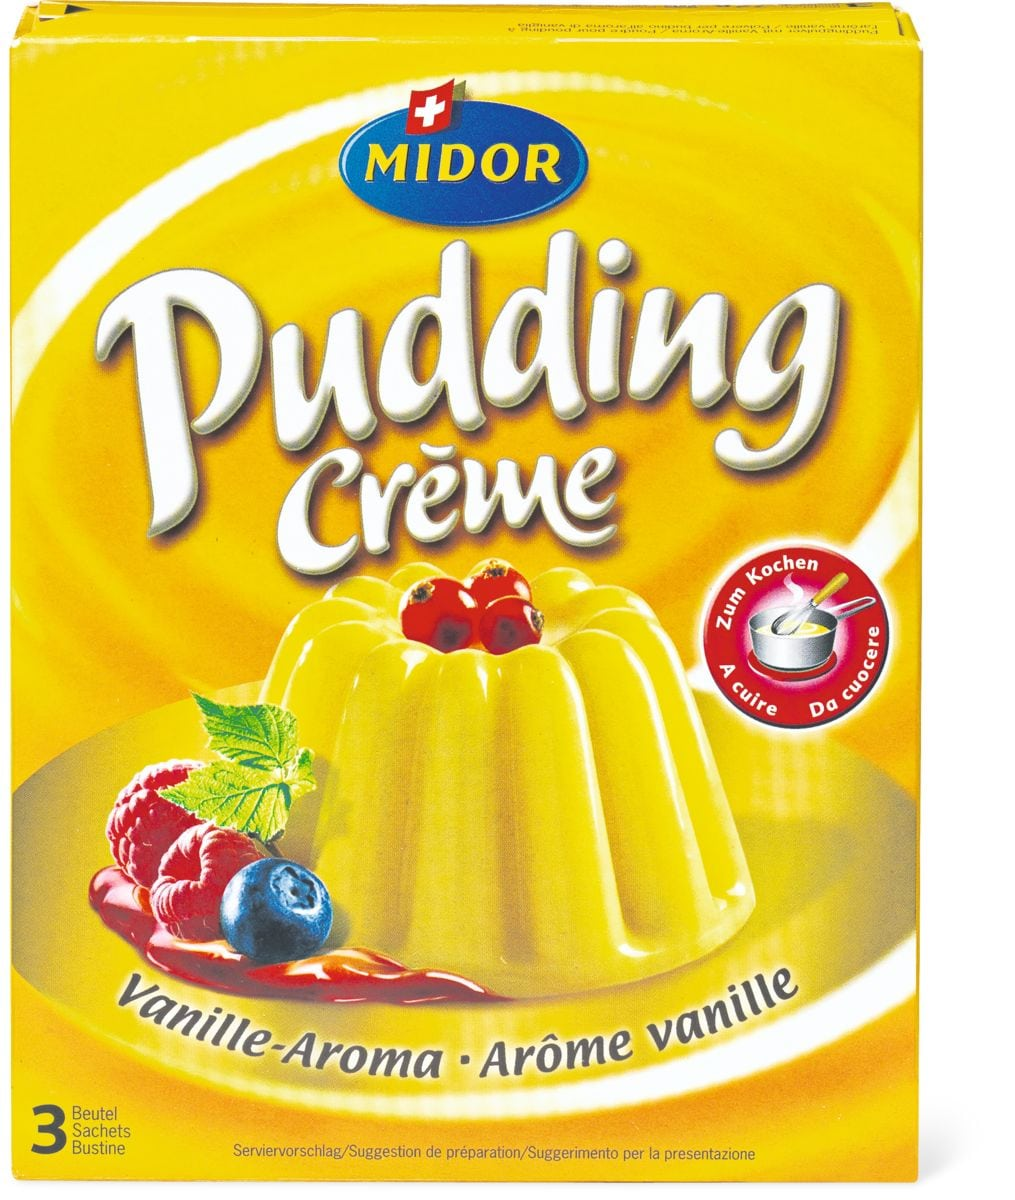 Pudding Crème Arôme vanille